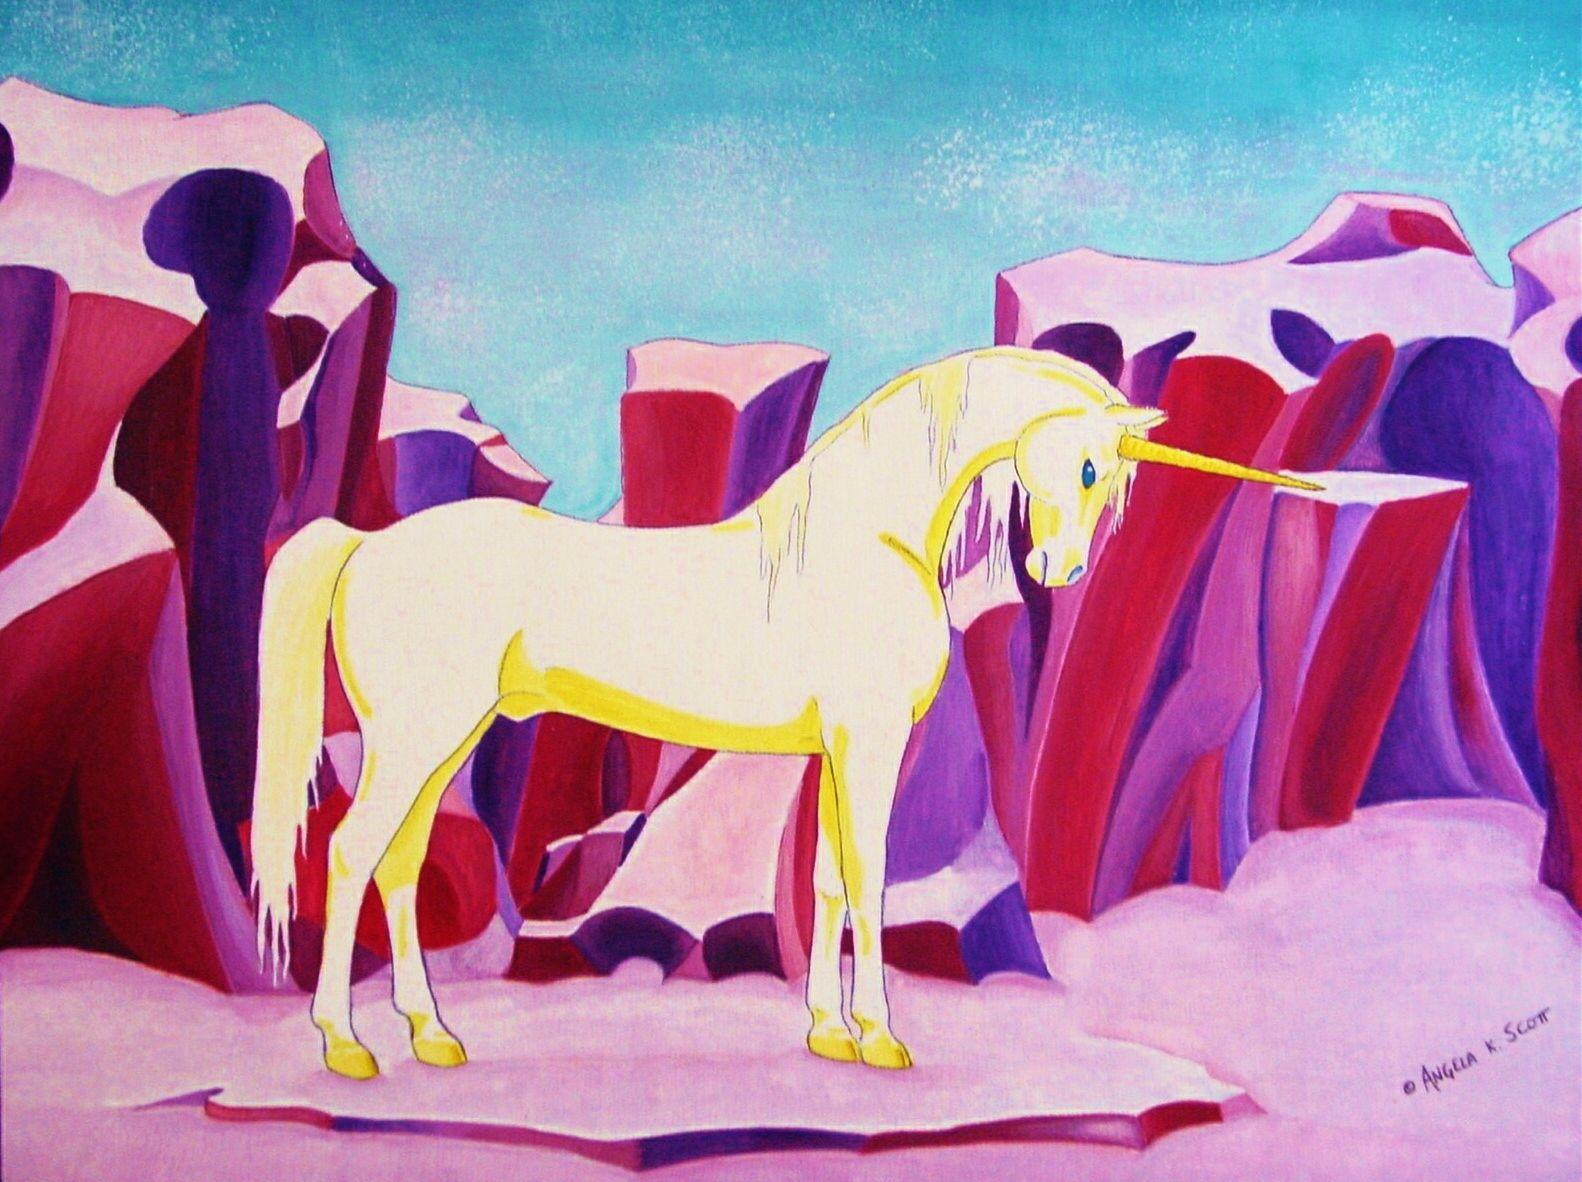 """Unicornus"" by Angela K. Scott  ~ Painting, Watercolors. I Love Unicorns!  ----Artwork, Art, Realism, Realistic, Animal, Horned Horse, Unicorn, Equine, Fantasy, Colorful, Rock Formations, Steed, Magic, Magical, Myth, Mythical, Mythological Creature, New Age, Mystic, Graceful, Beauty, Noble, Medieval, Fantasy, Poised, Pose, Believe, Belief, Enchanted, Imaginative, Landscape."